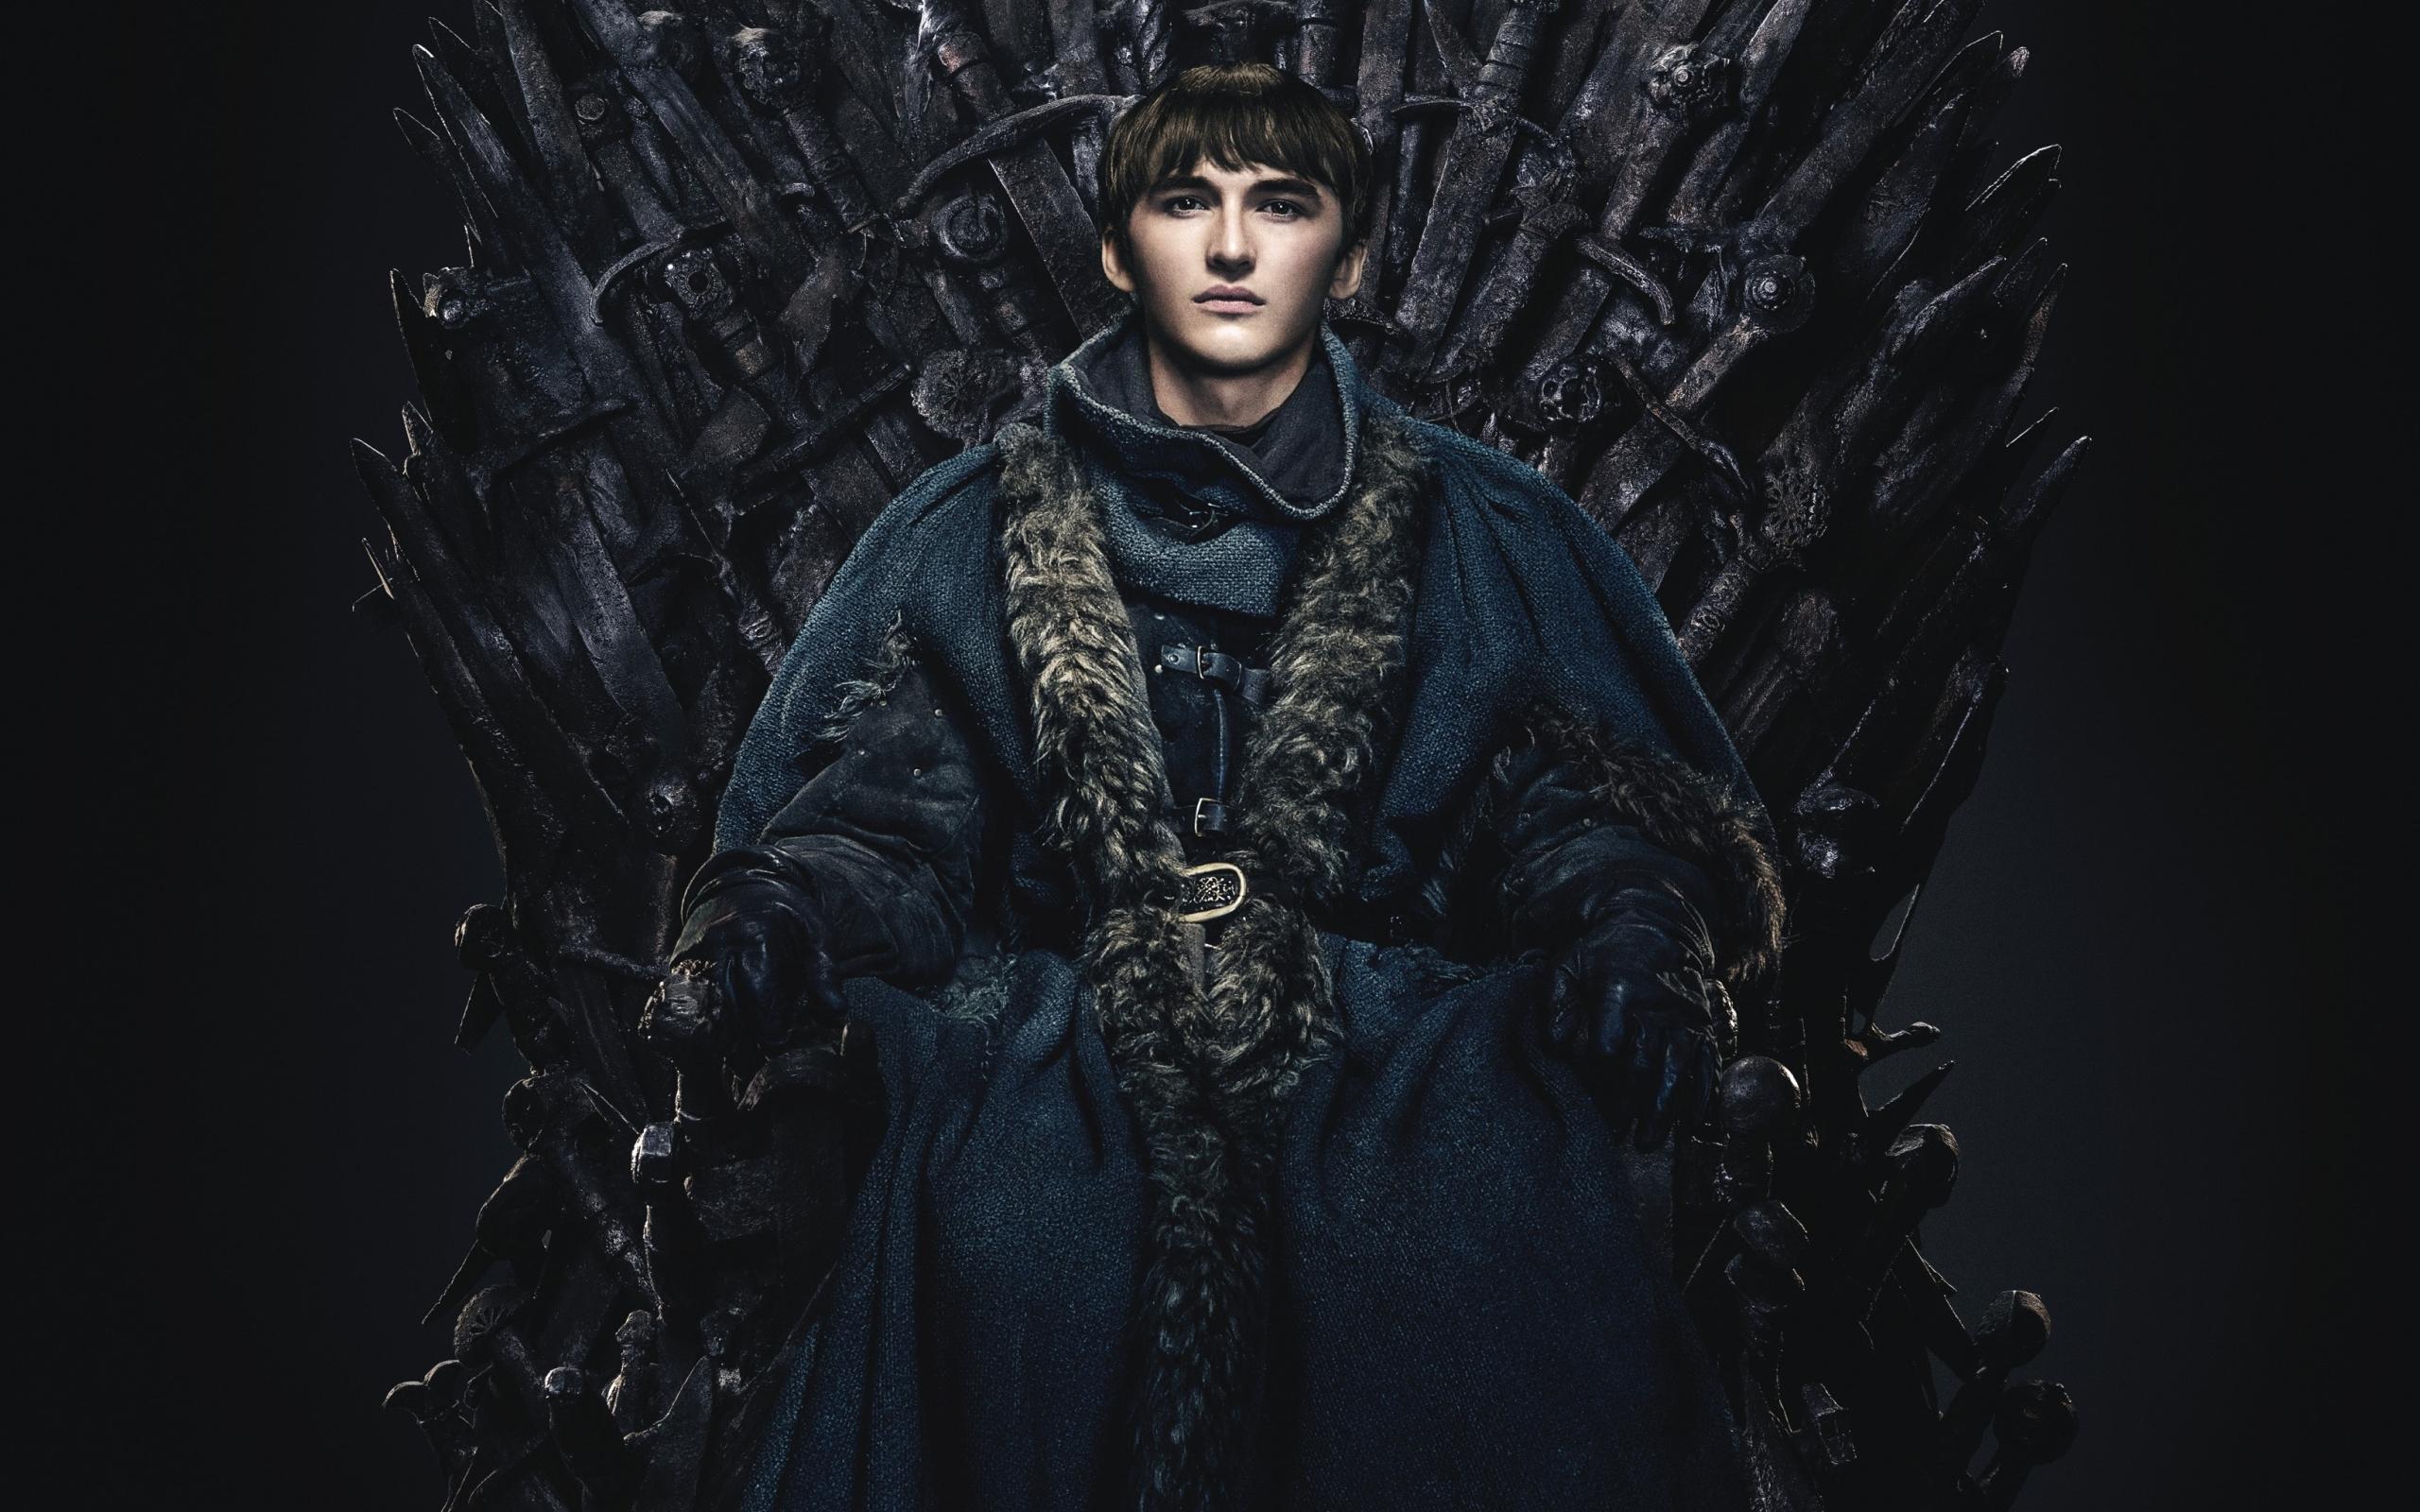 Wallpaper of Bran Stark Isaac Hempstead Wright Game of Throne 2560x1600